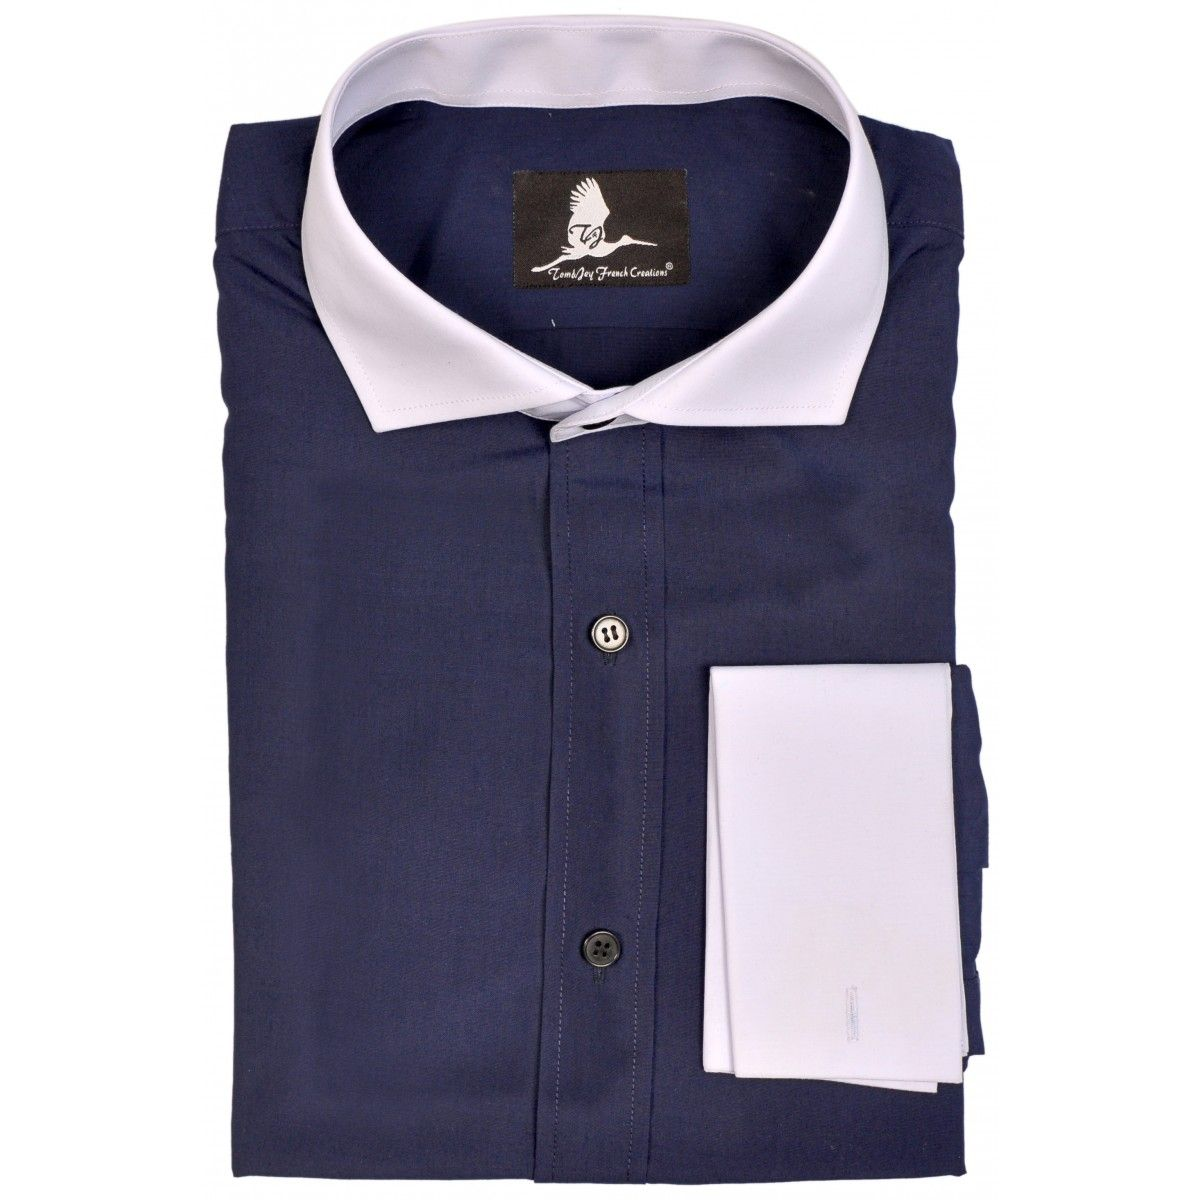 7962a2467a Dark Blue White Collar & Cuffs Shirt | Contrast shirts | Shirt cuff ...